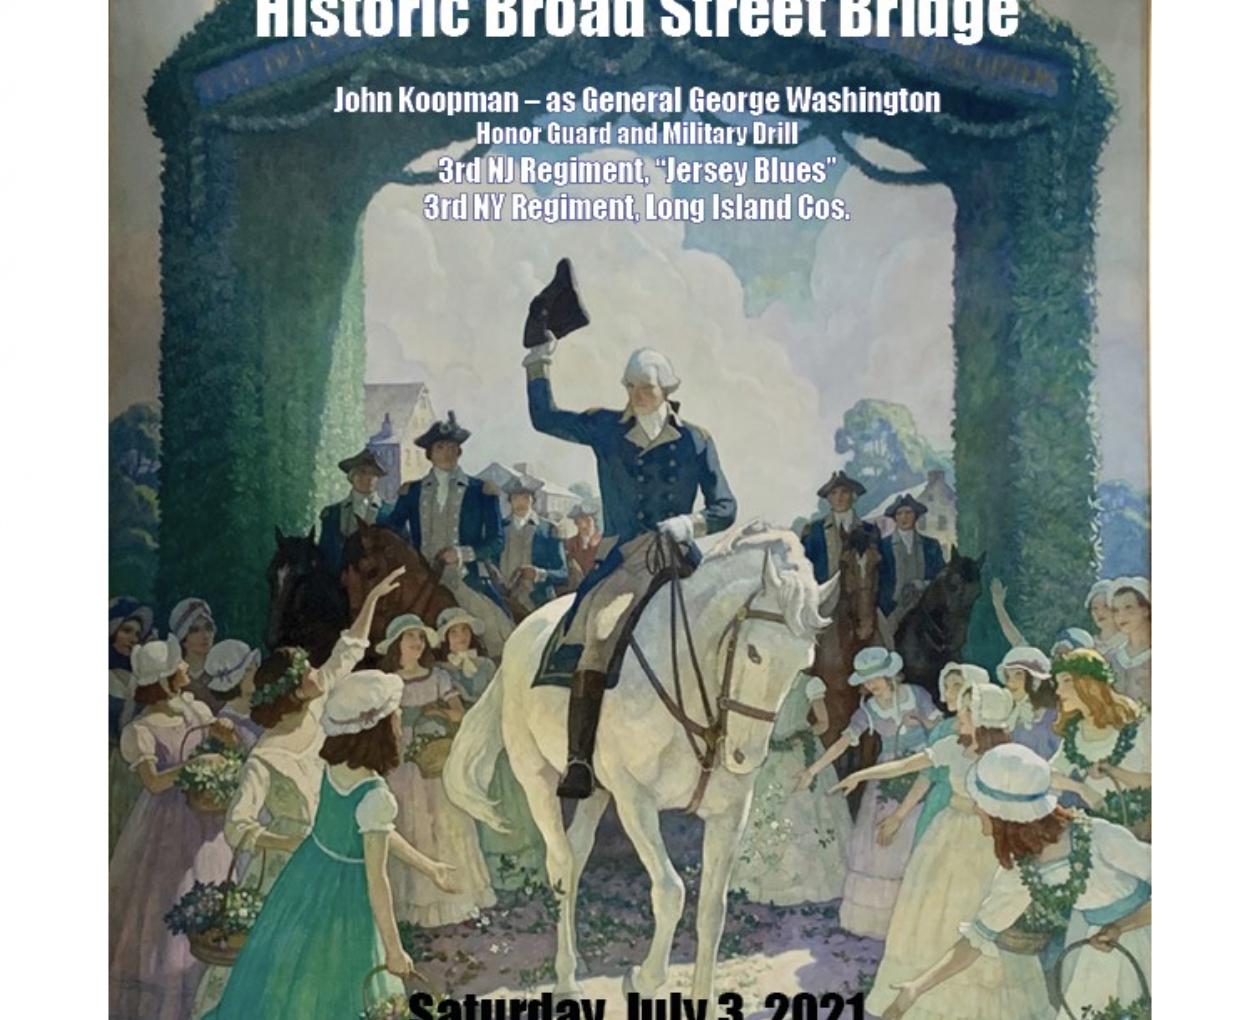 A Celebration of the Historic Broadstreet Bridge